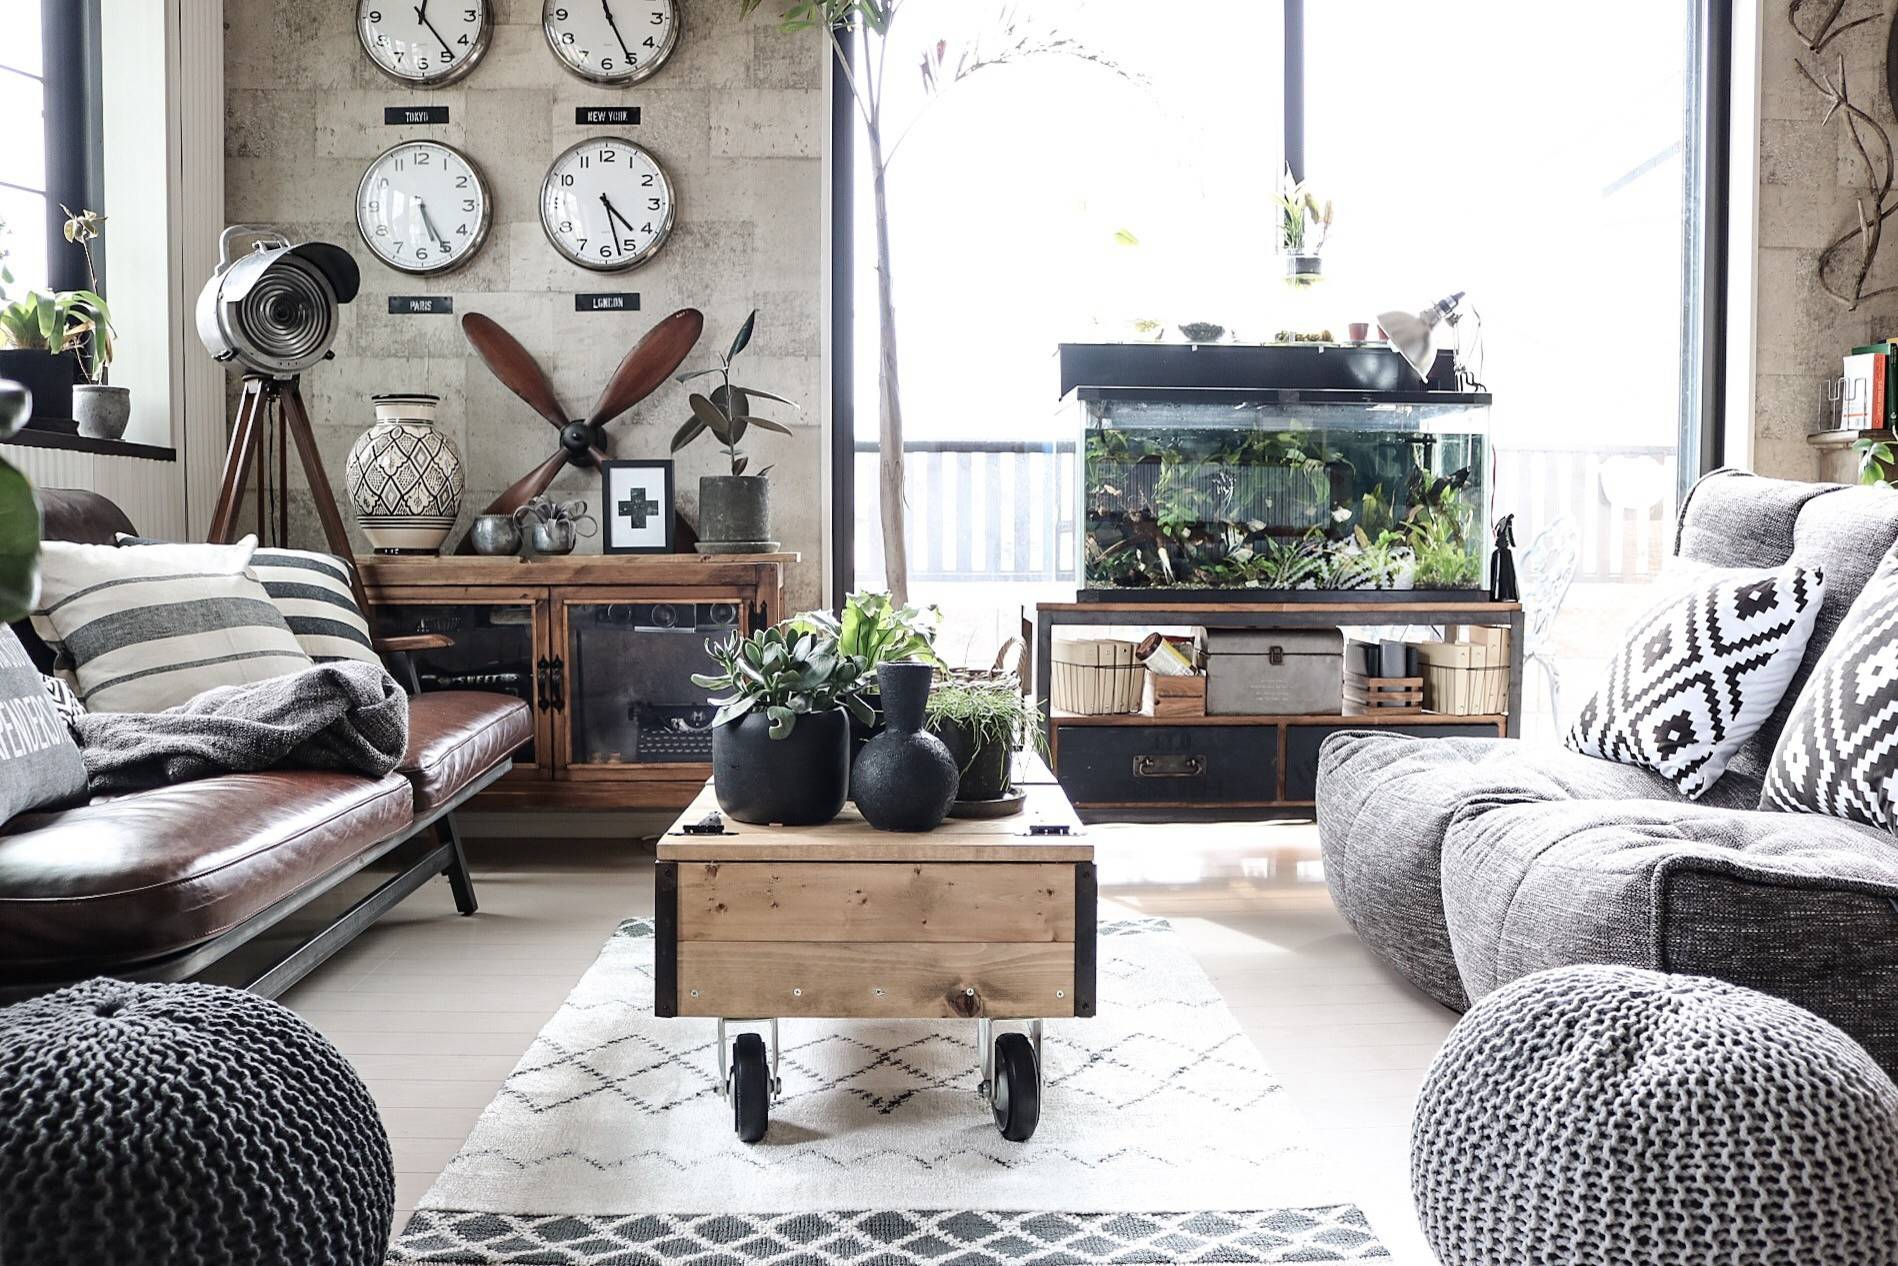 A Beanbag Chair In Modern Interior, Bean Bags For Living Room